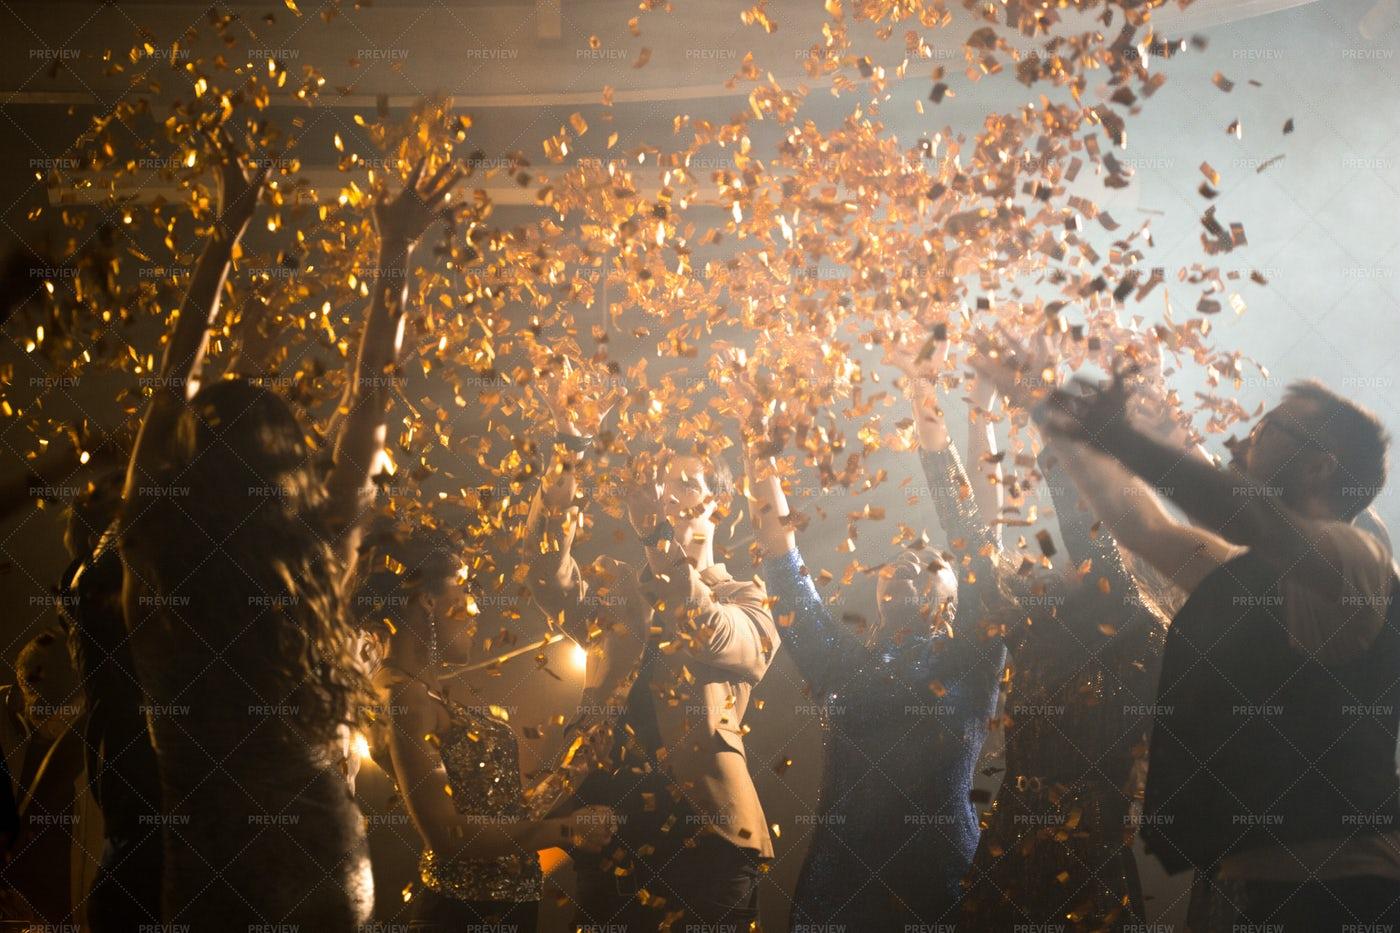 Enjoying Party At Night Club: Stock Photos